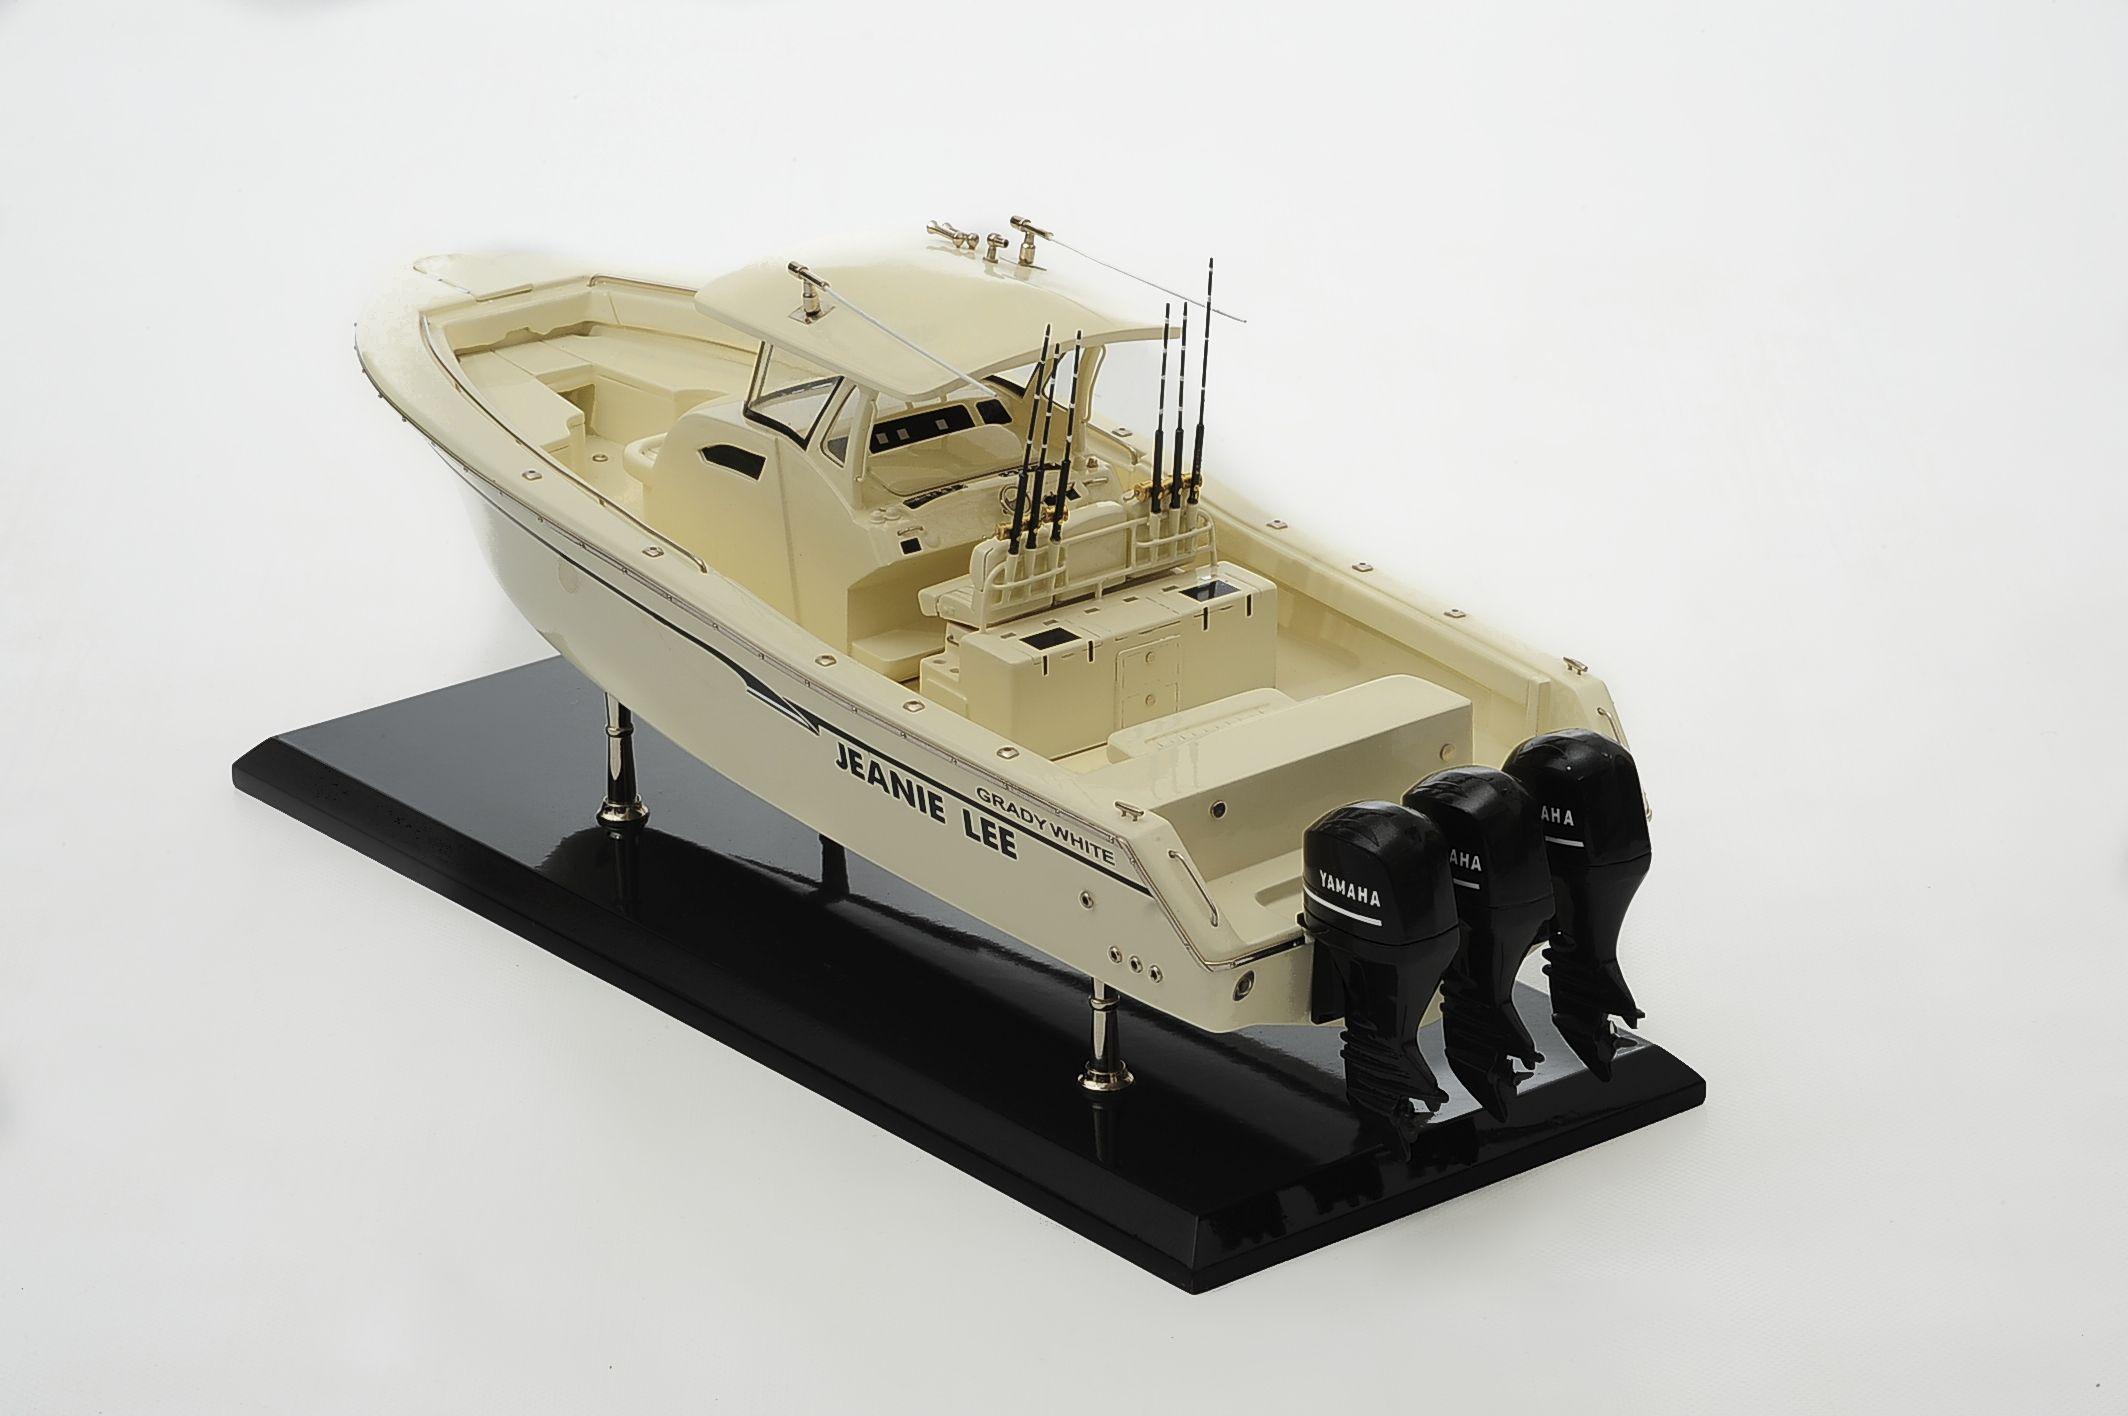 1390-8700-Grady-366-Yacht